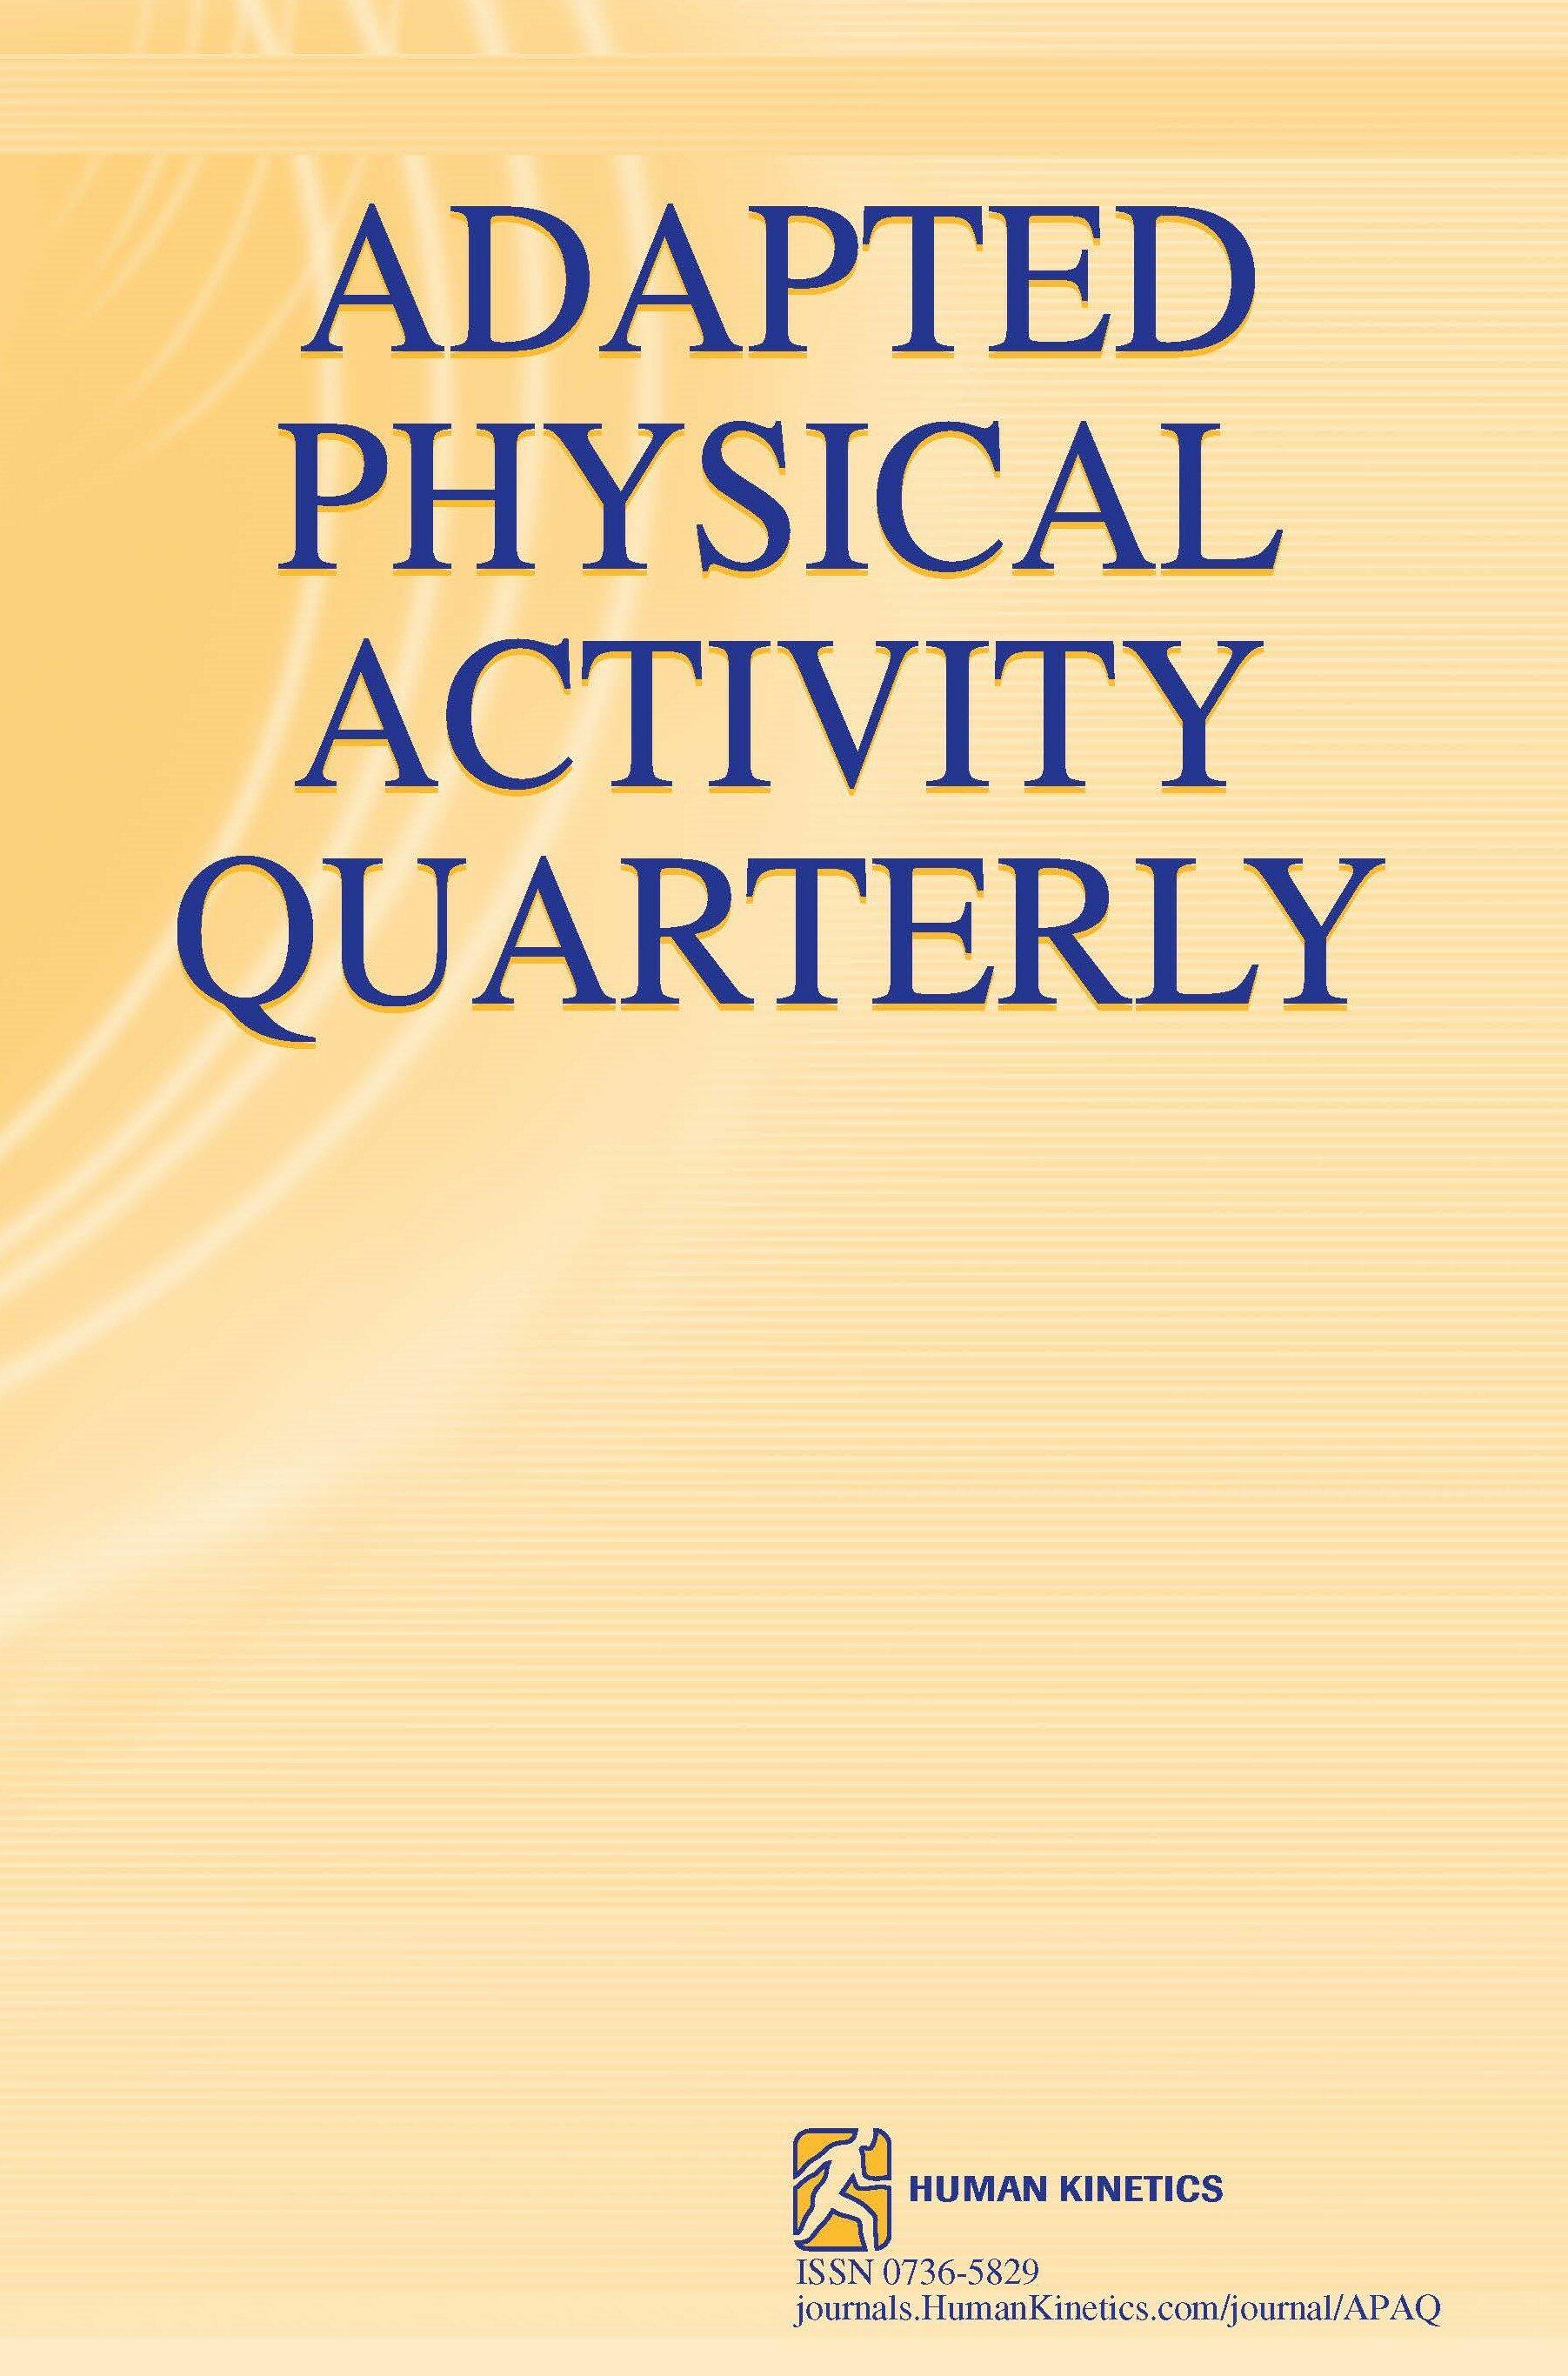 Adapted Physical Activity Quarterly Human Kinetics